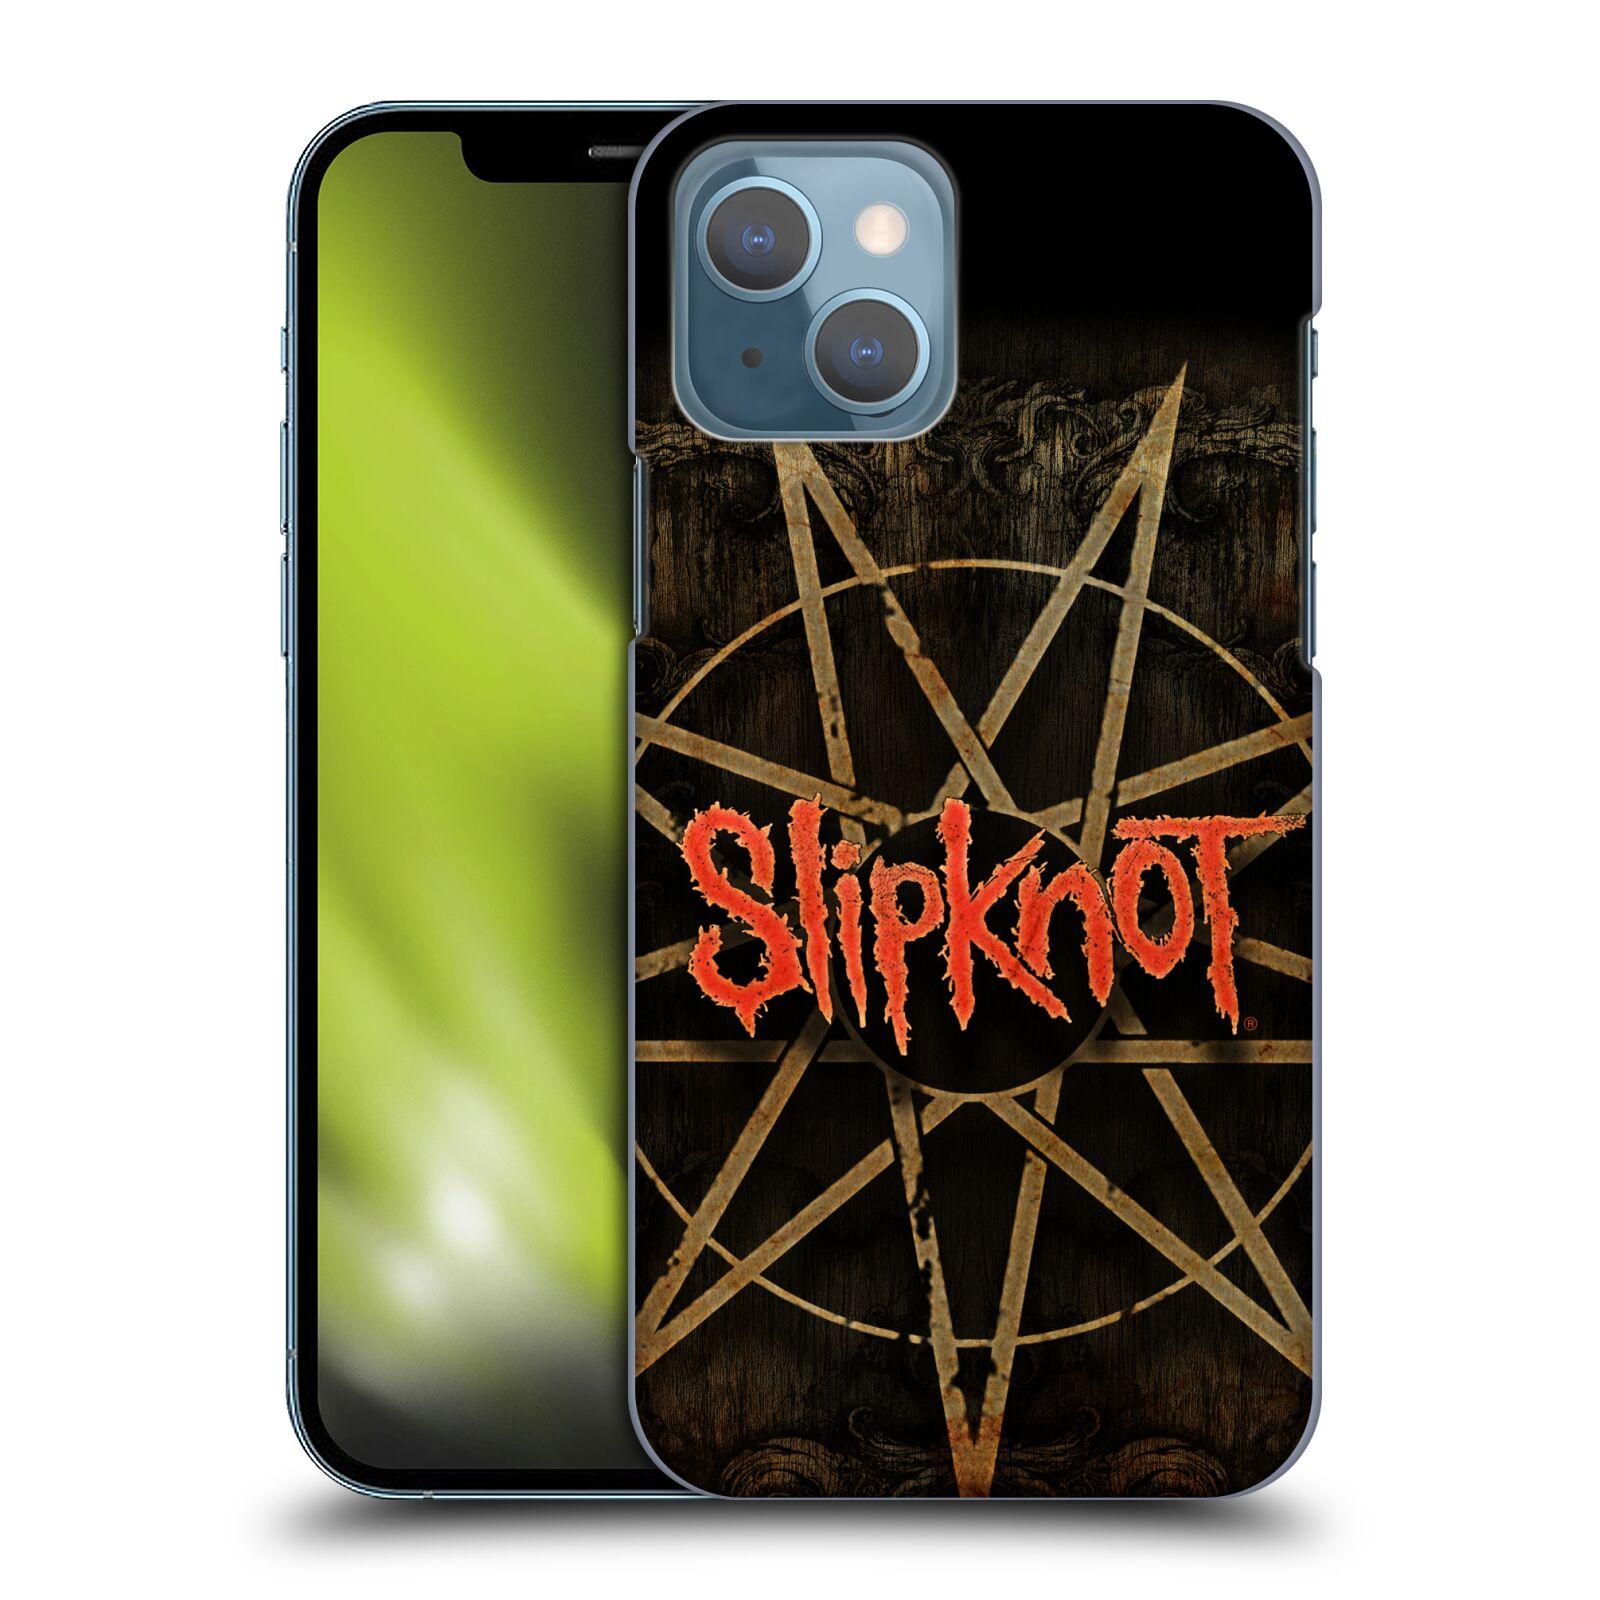 Plastové pouzdro na mobil Apple iPhone 13 - Head Case - Slipknot - Znak